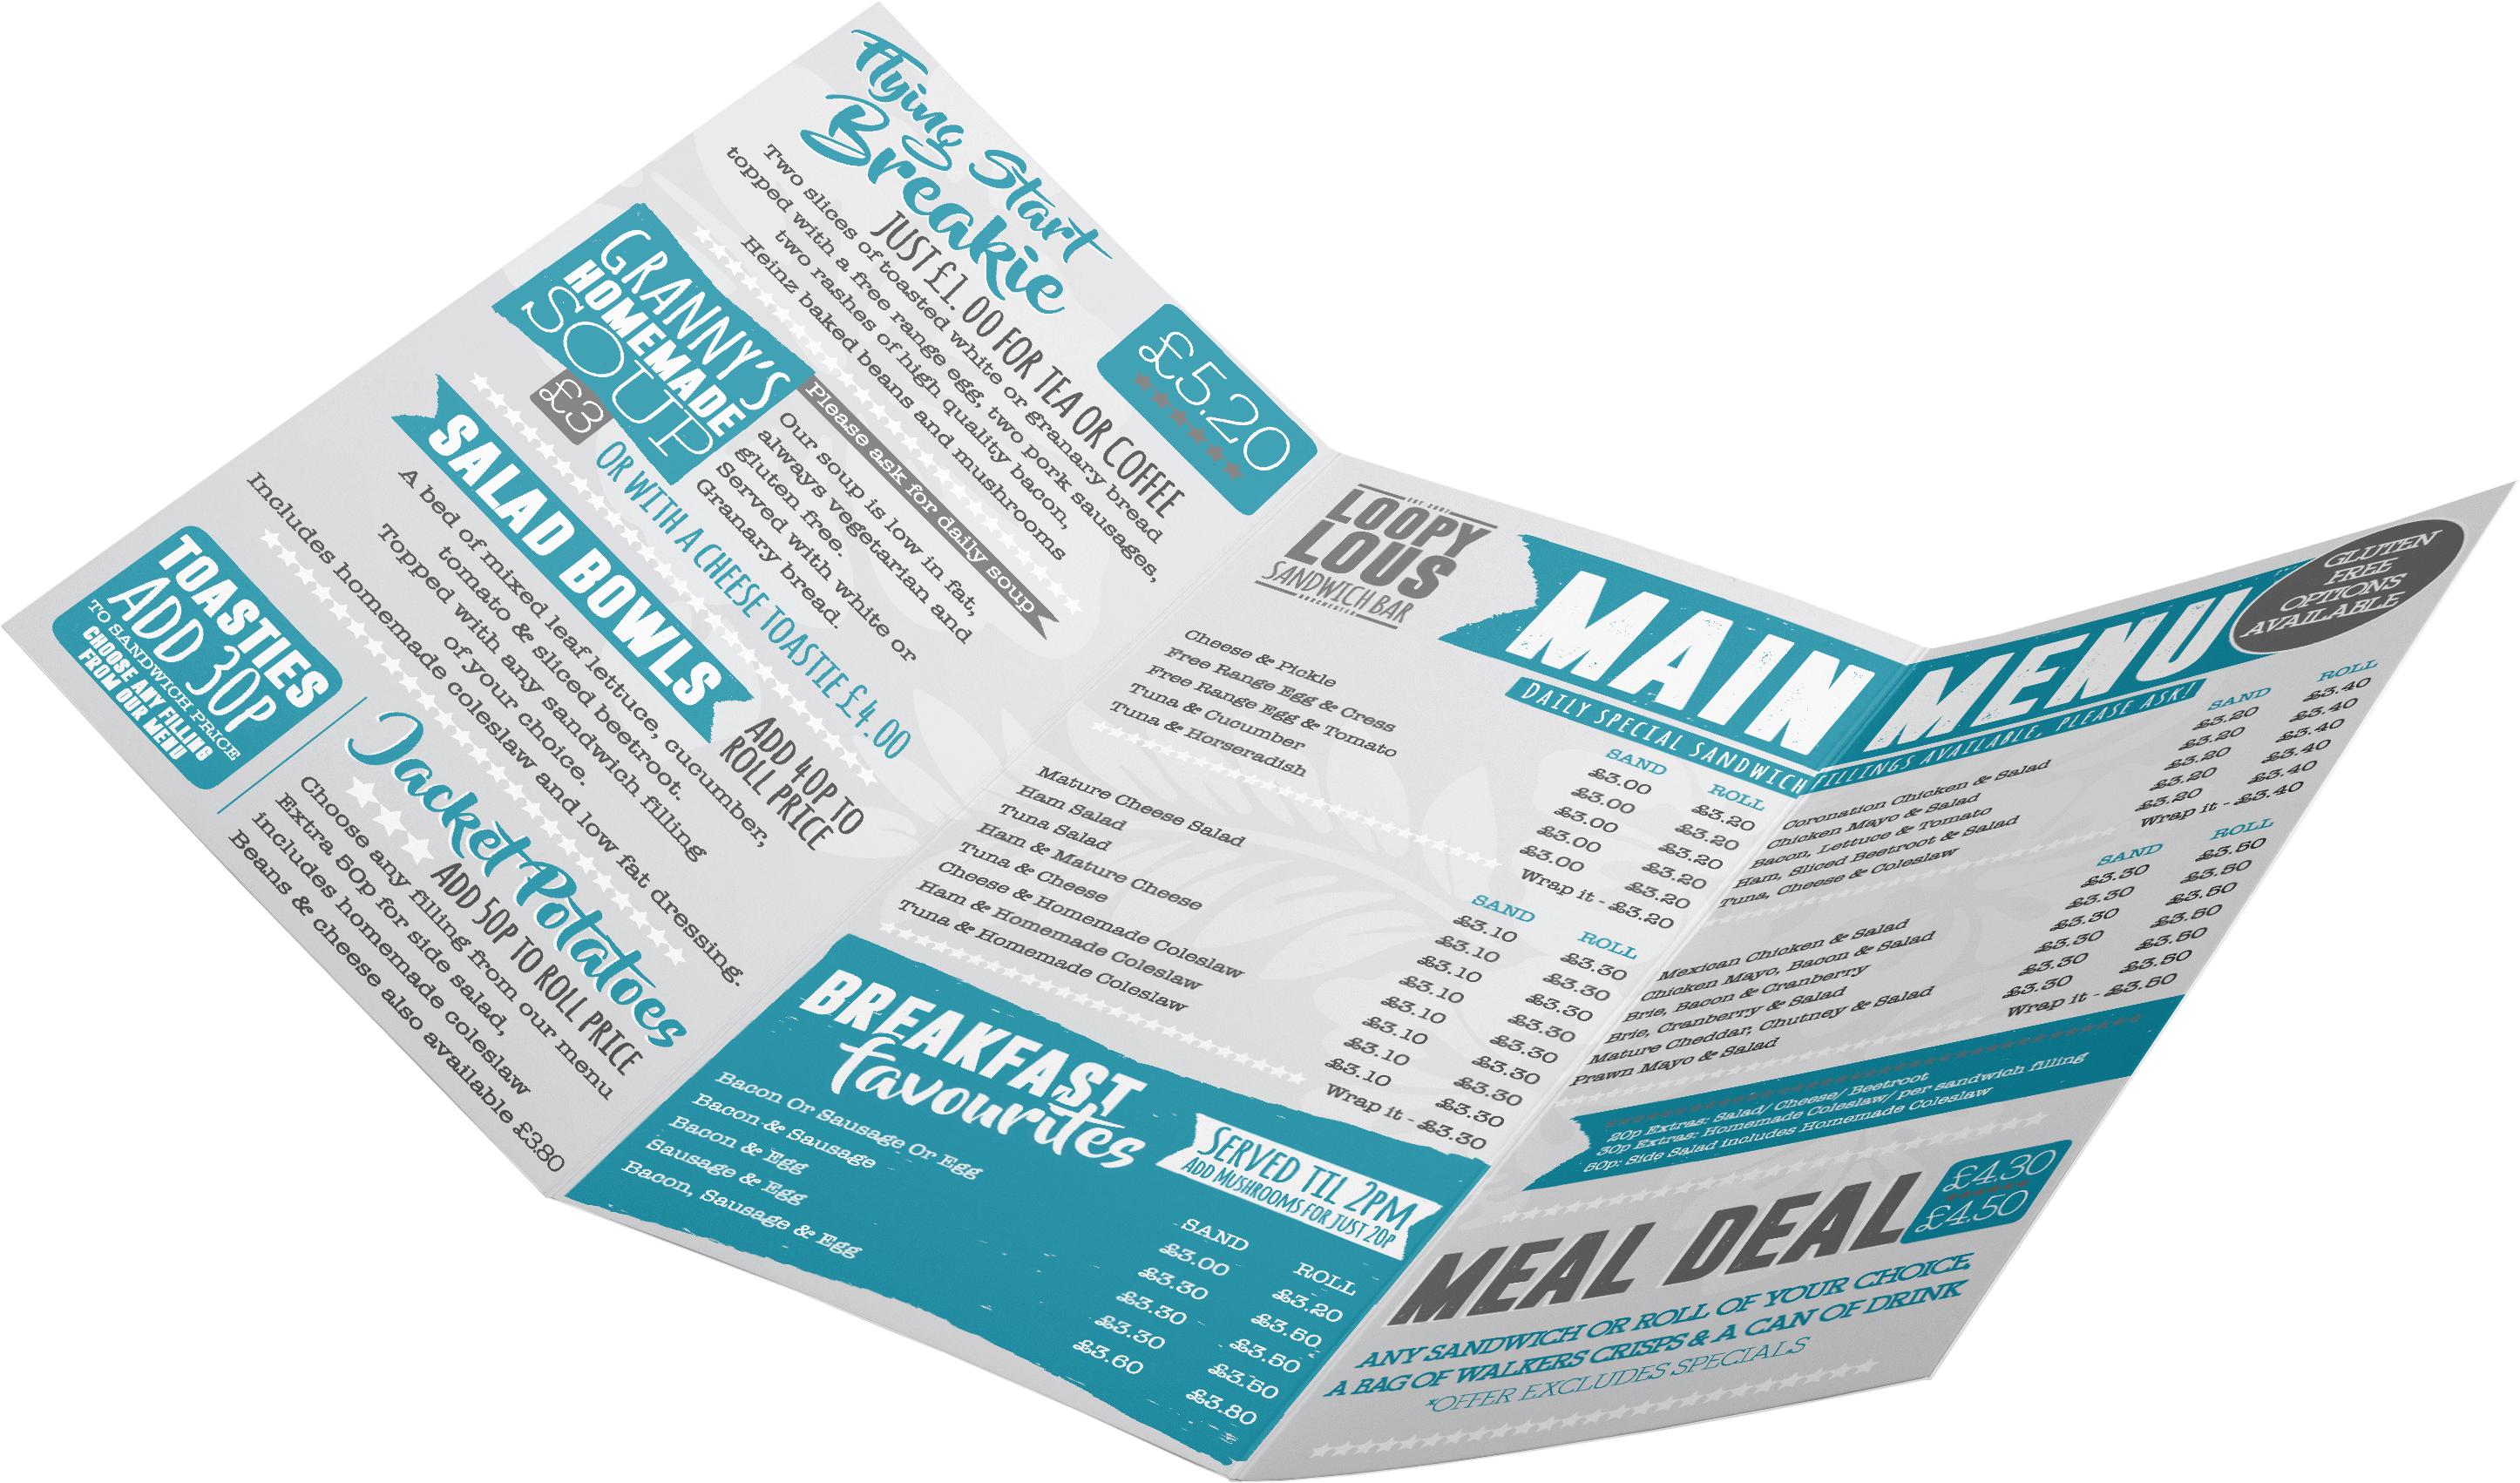 Folded-Flyer-Printing-Weymouth-Dorset